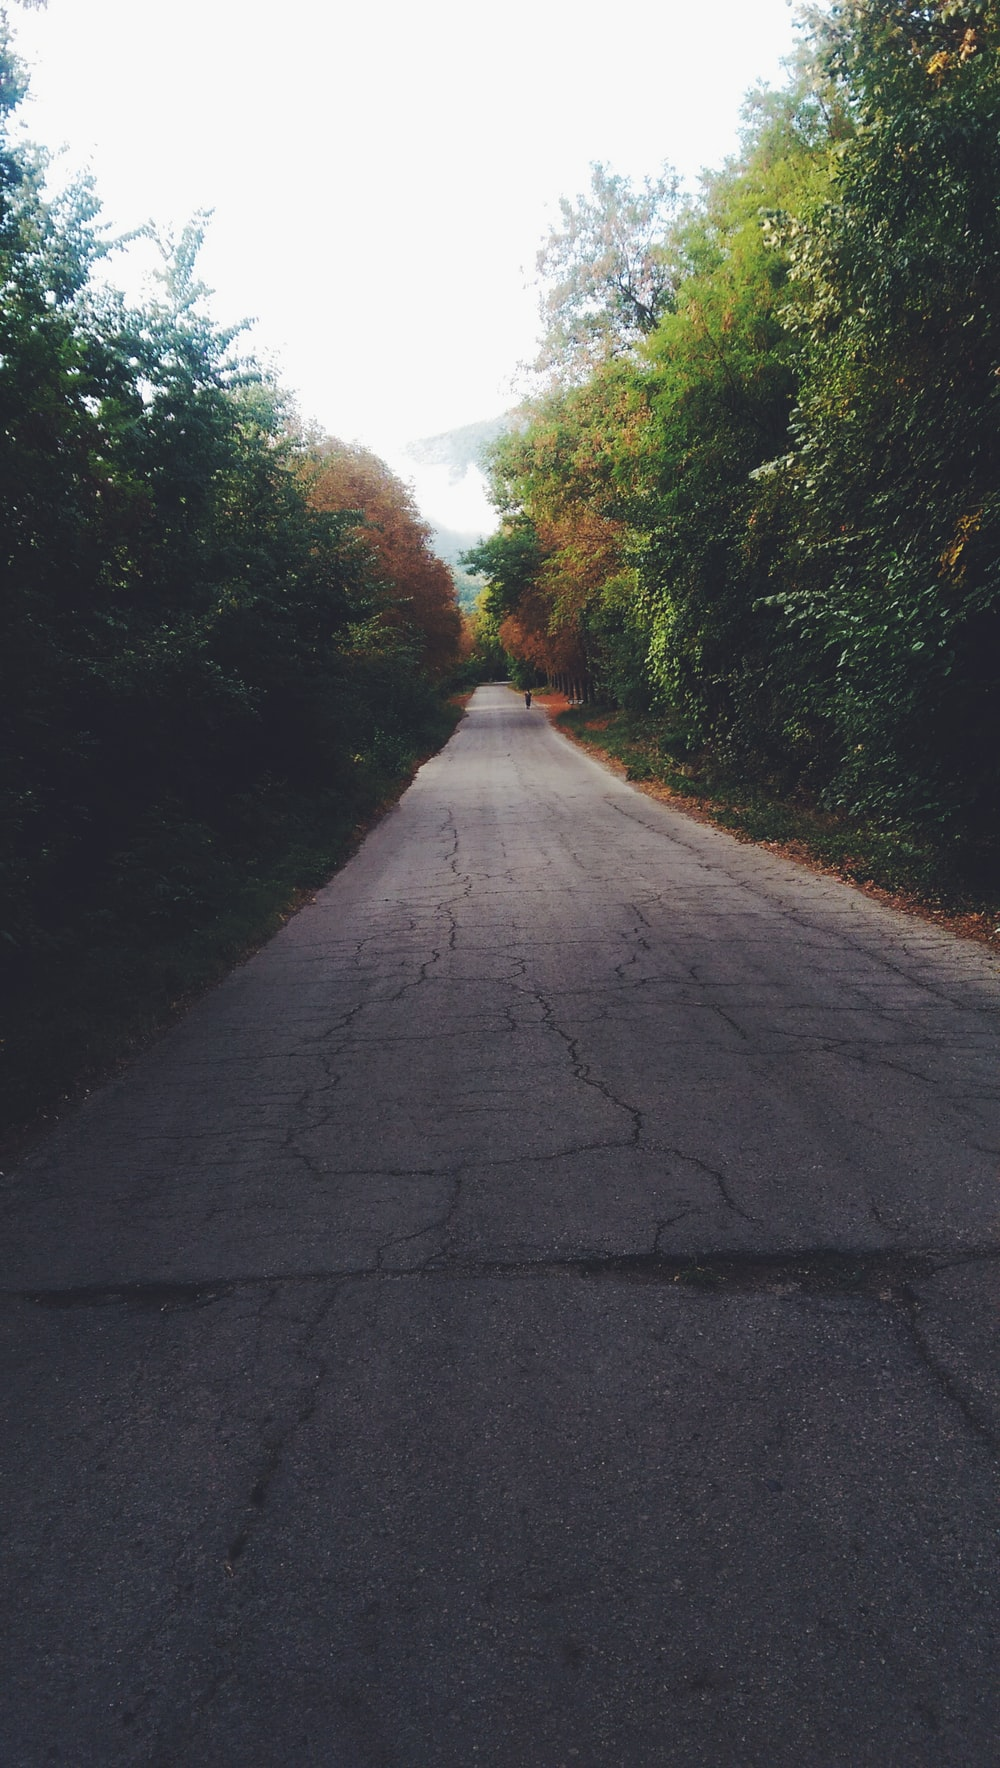 empty road between trees under white sky